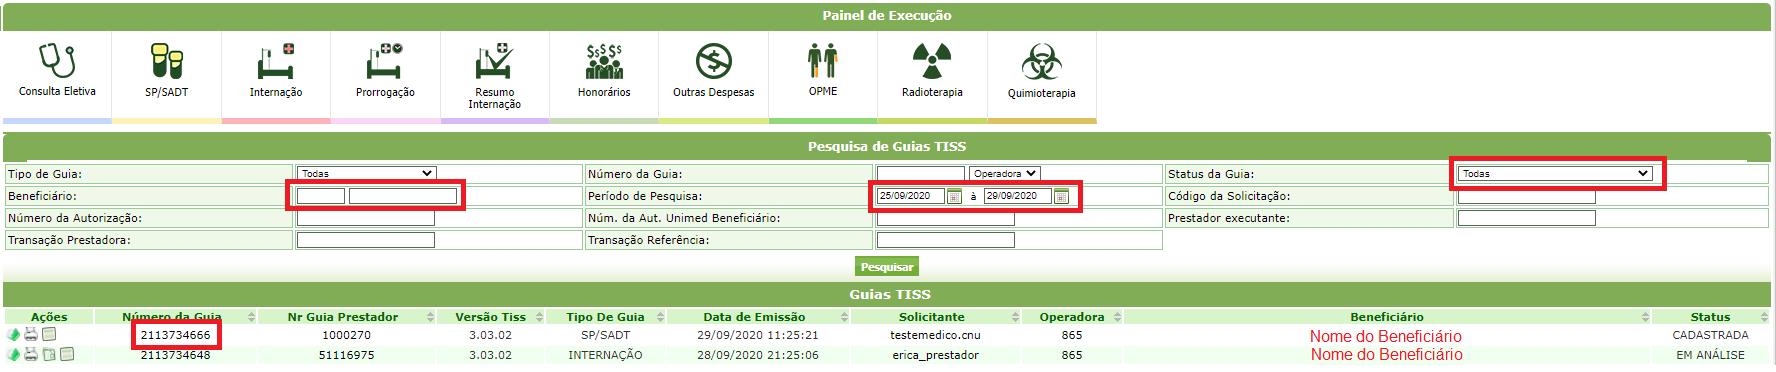 Consulta Pedido Médico  - Exames Prestador